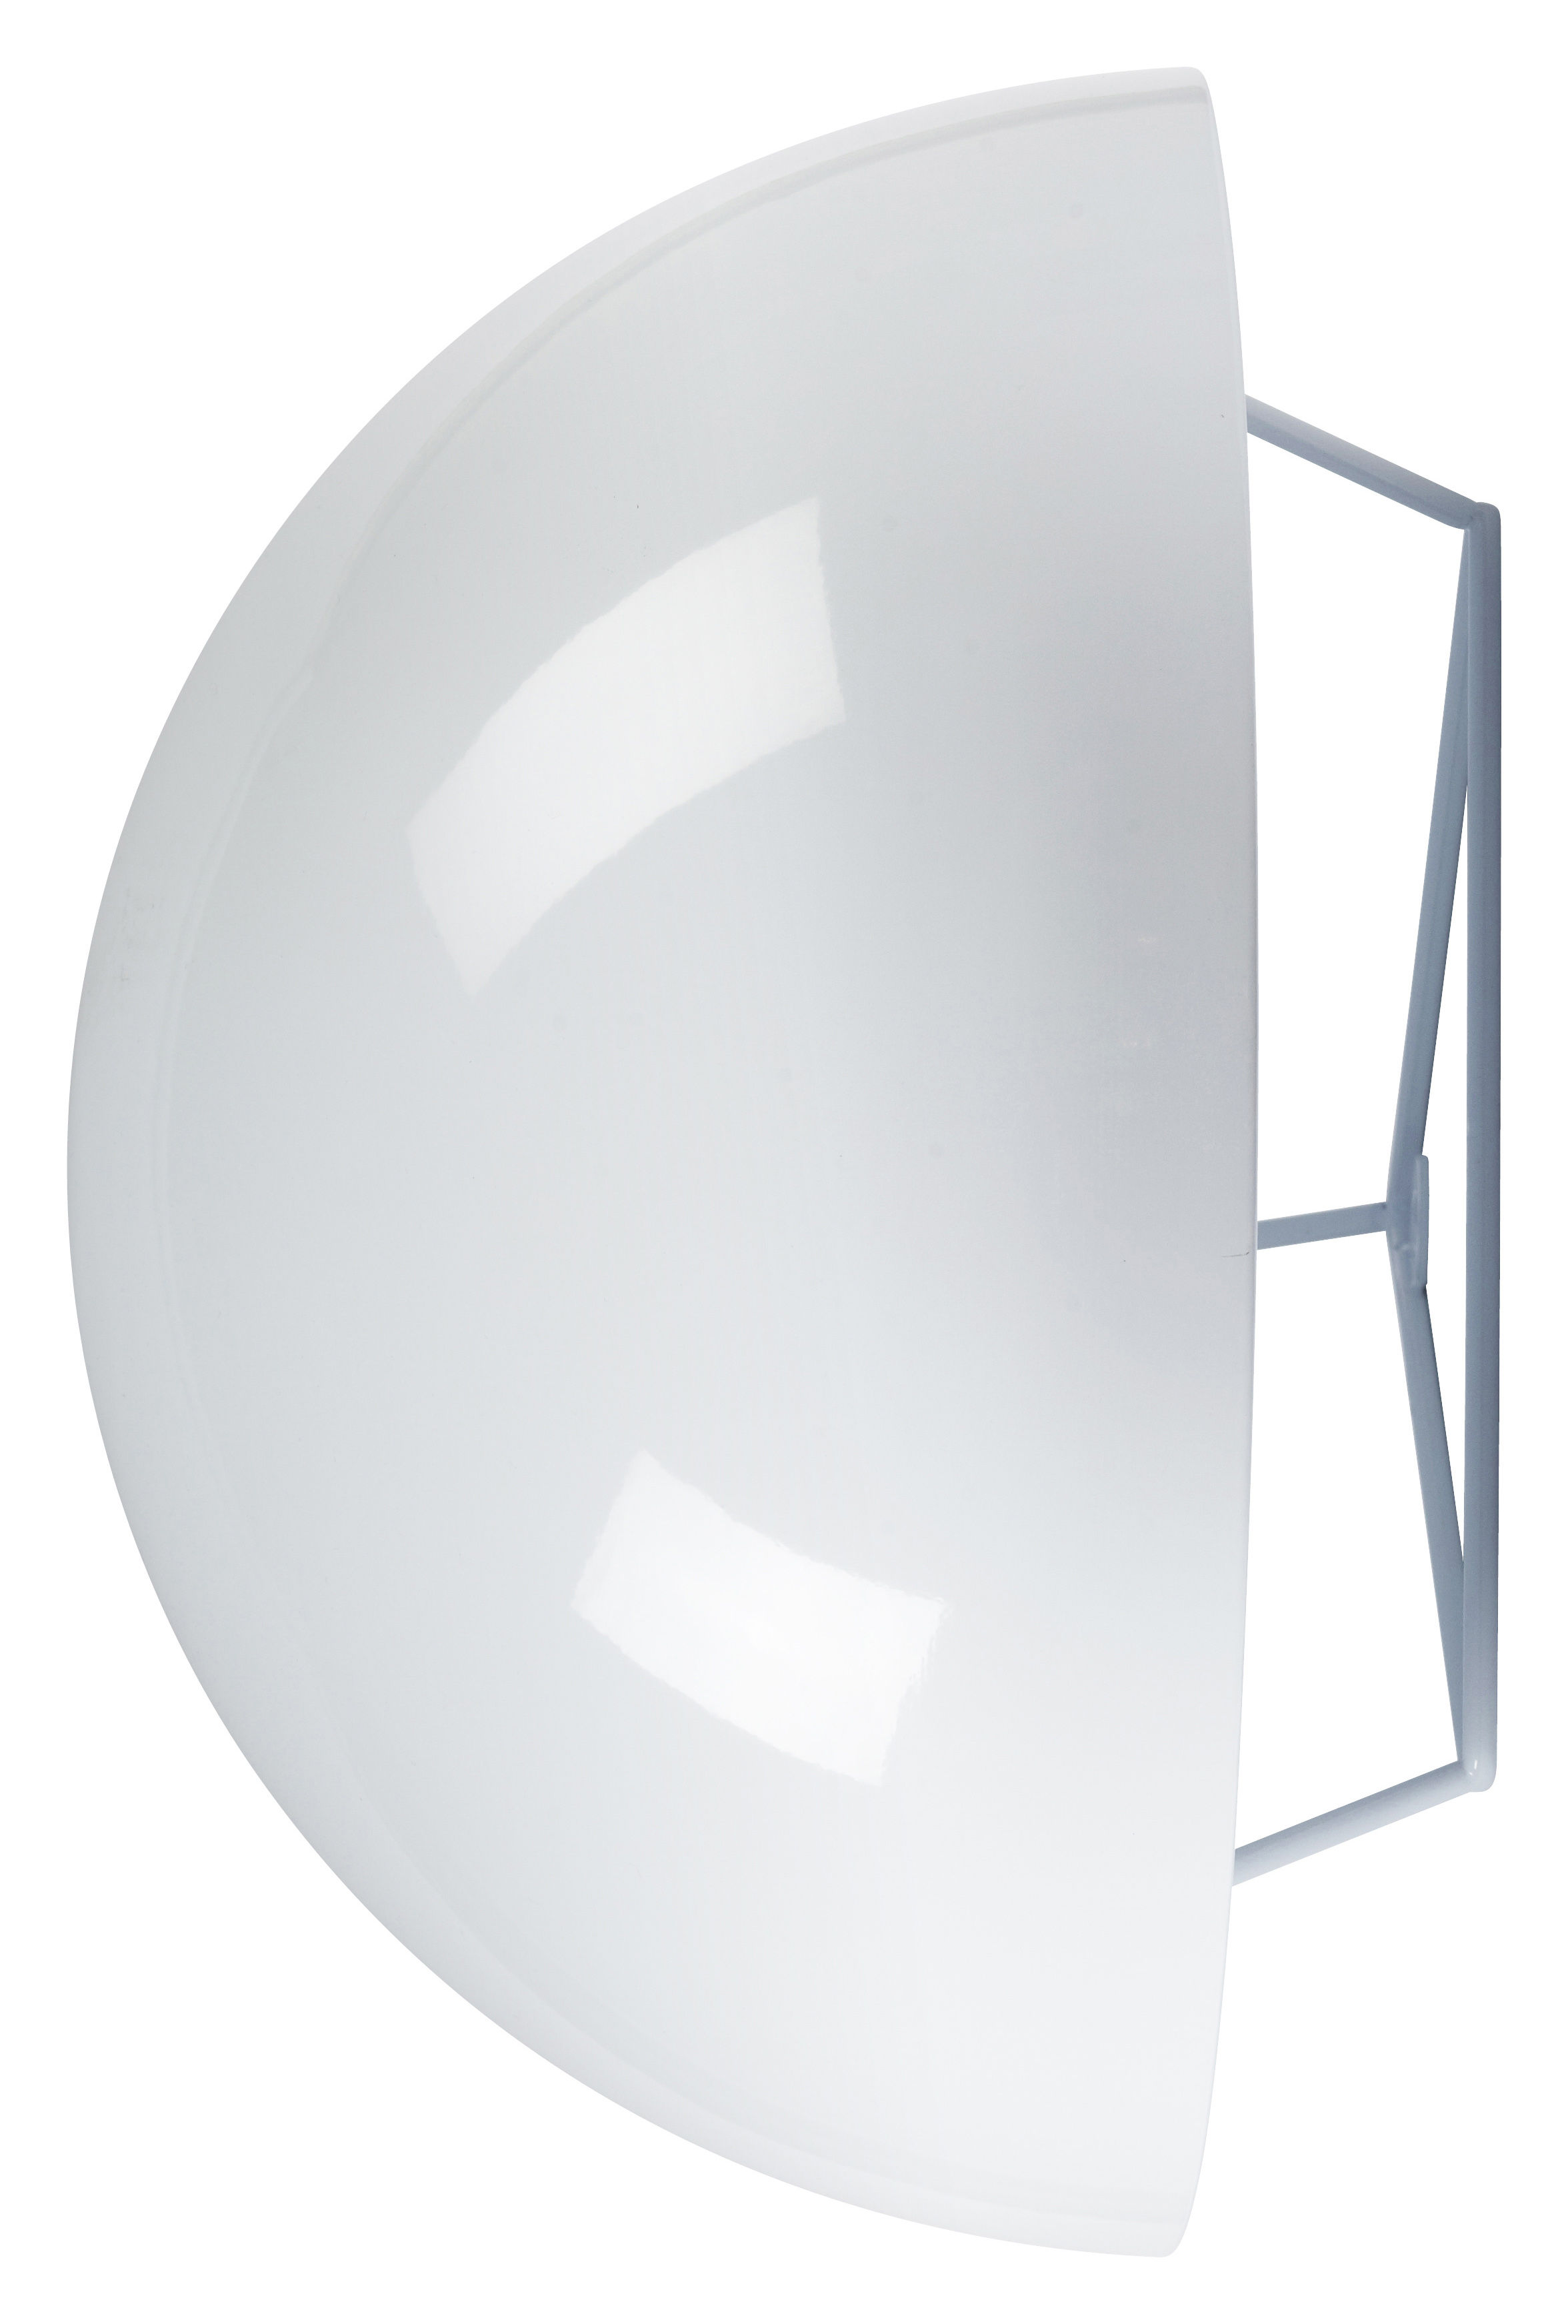 Leuchten - Wandleuchten - Dom Wandleuchte Groß - Ø 39,5 cm - Forestier - Ø 39,5 cm - weiß - lackiertes Metall